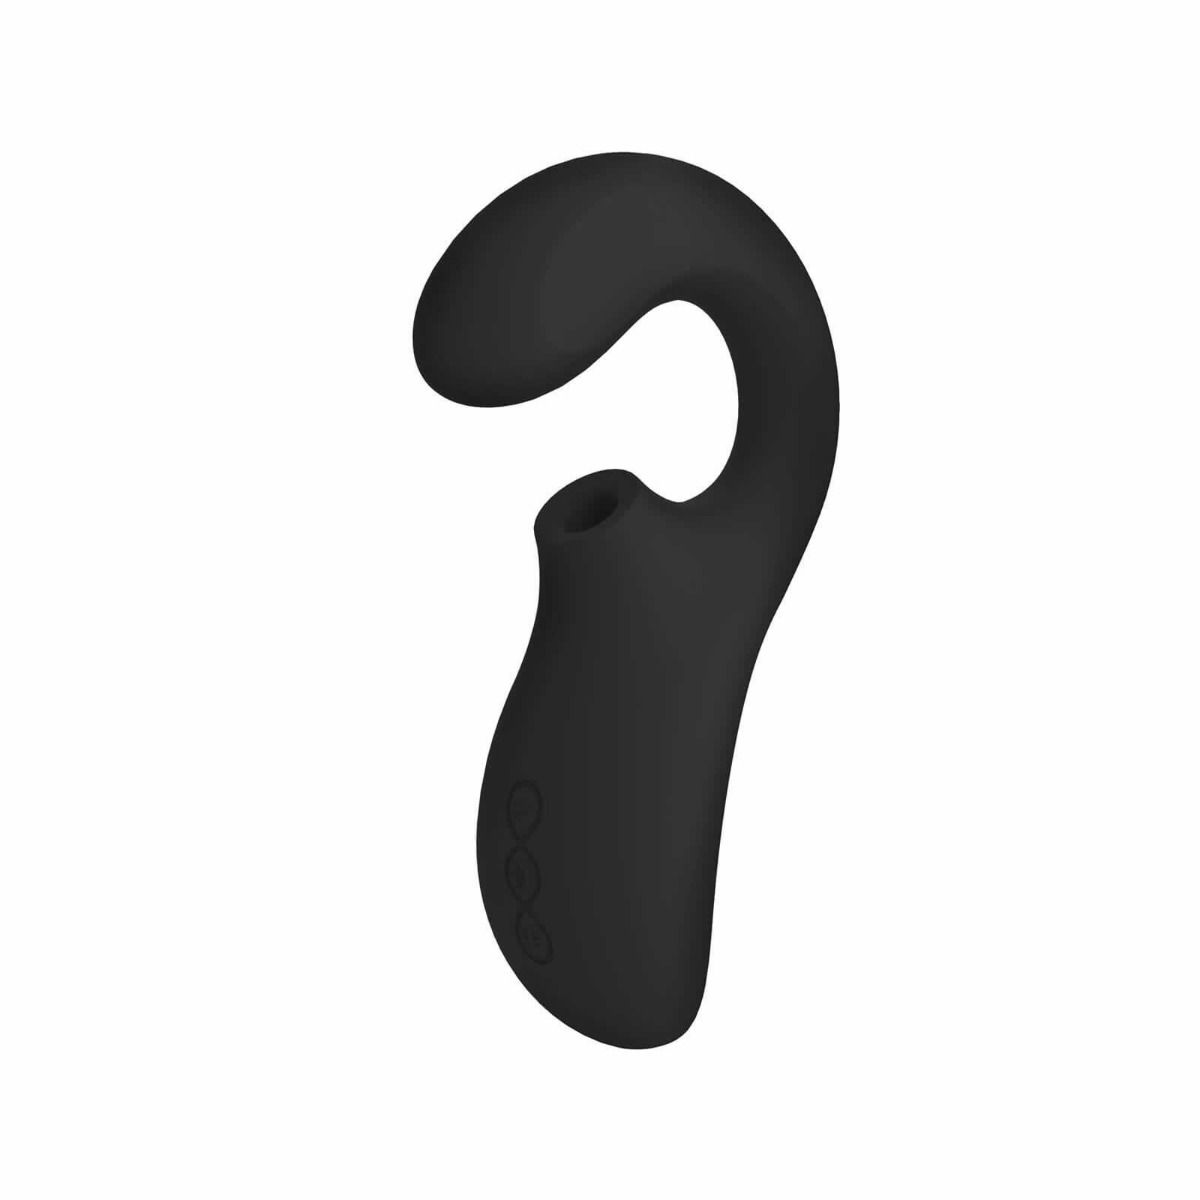 Lelo Enigma Clitoral G-Spot Vibrator Black